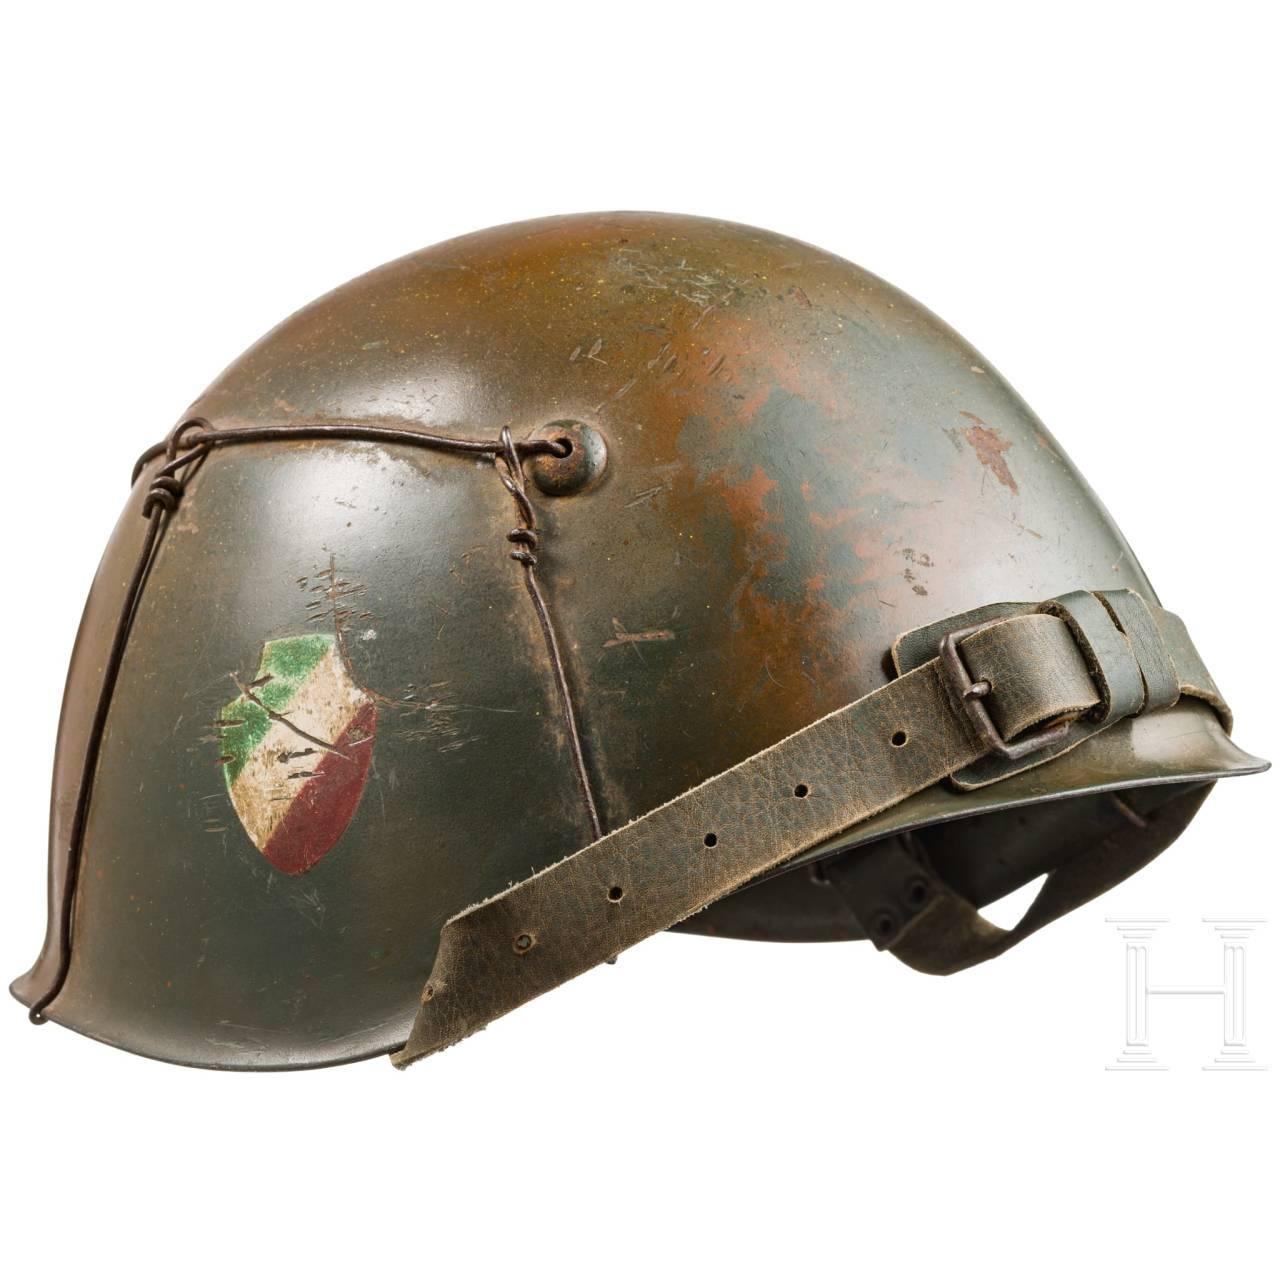 Stahlhelm der Divisione Italia in Tarnfarben, um 1943